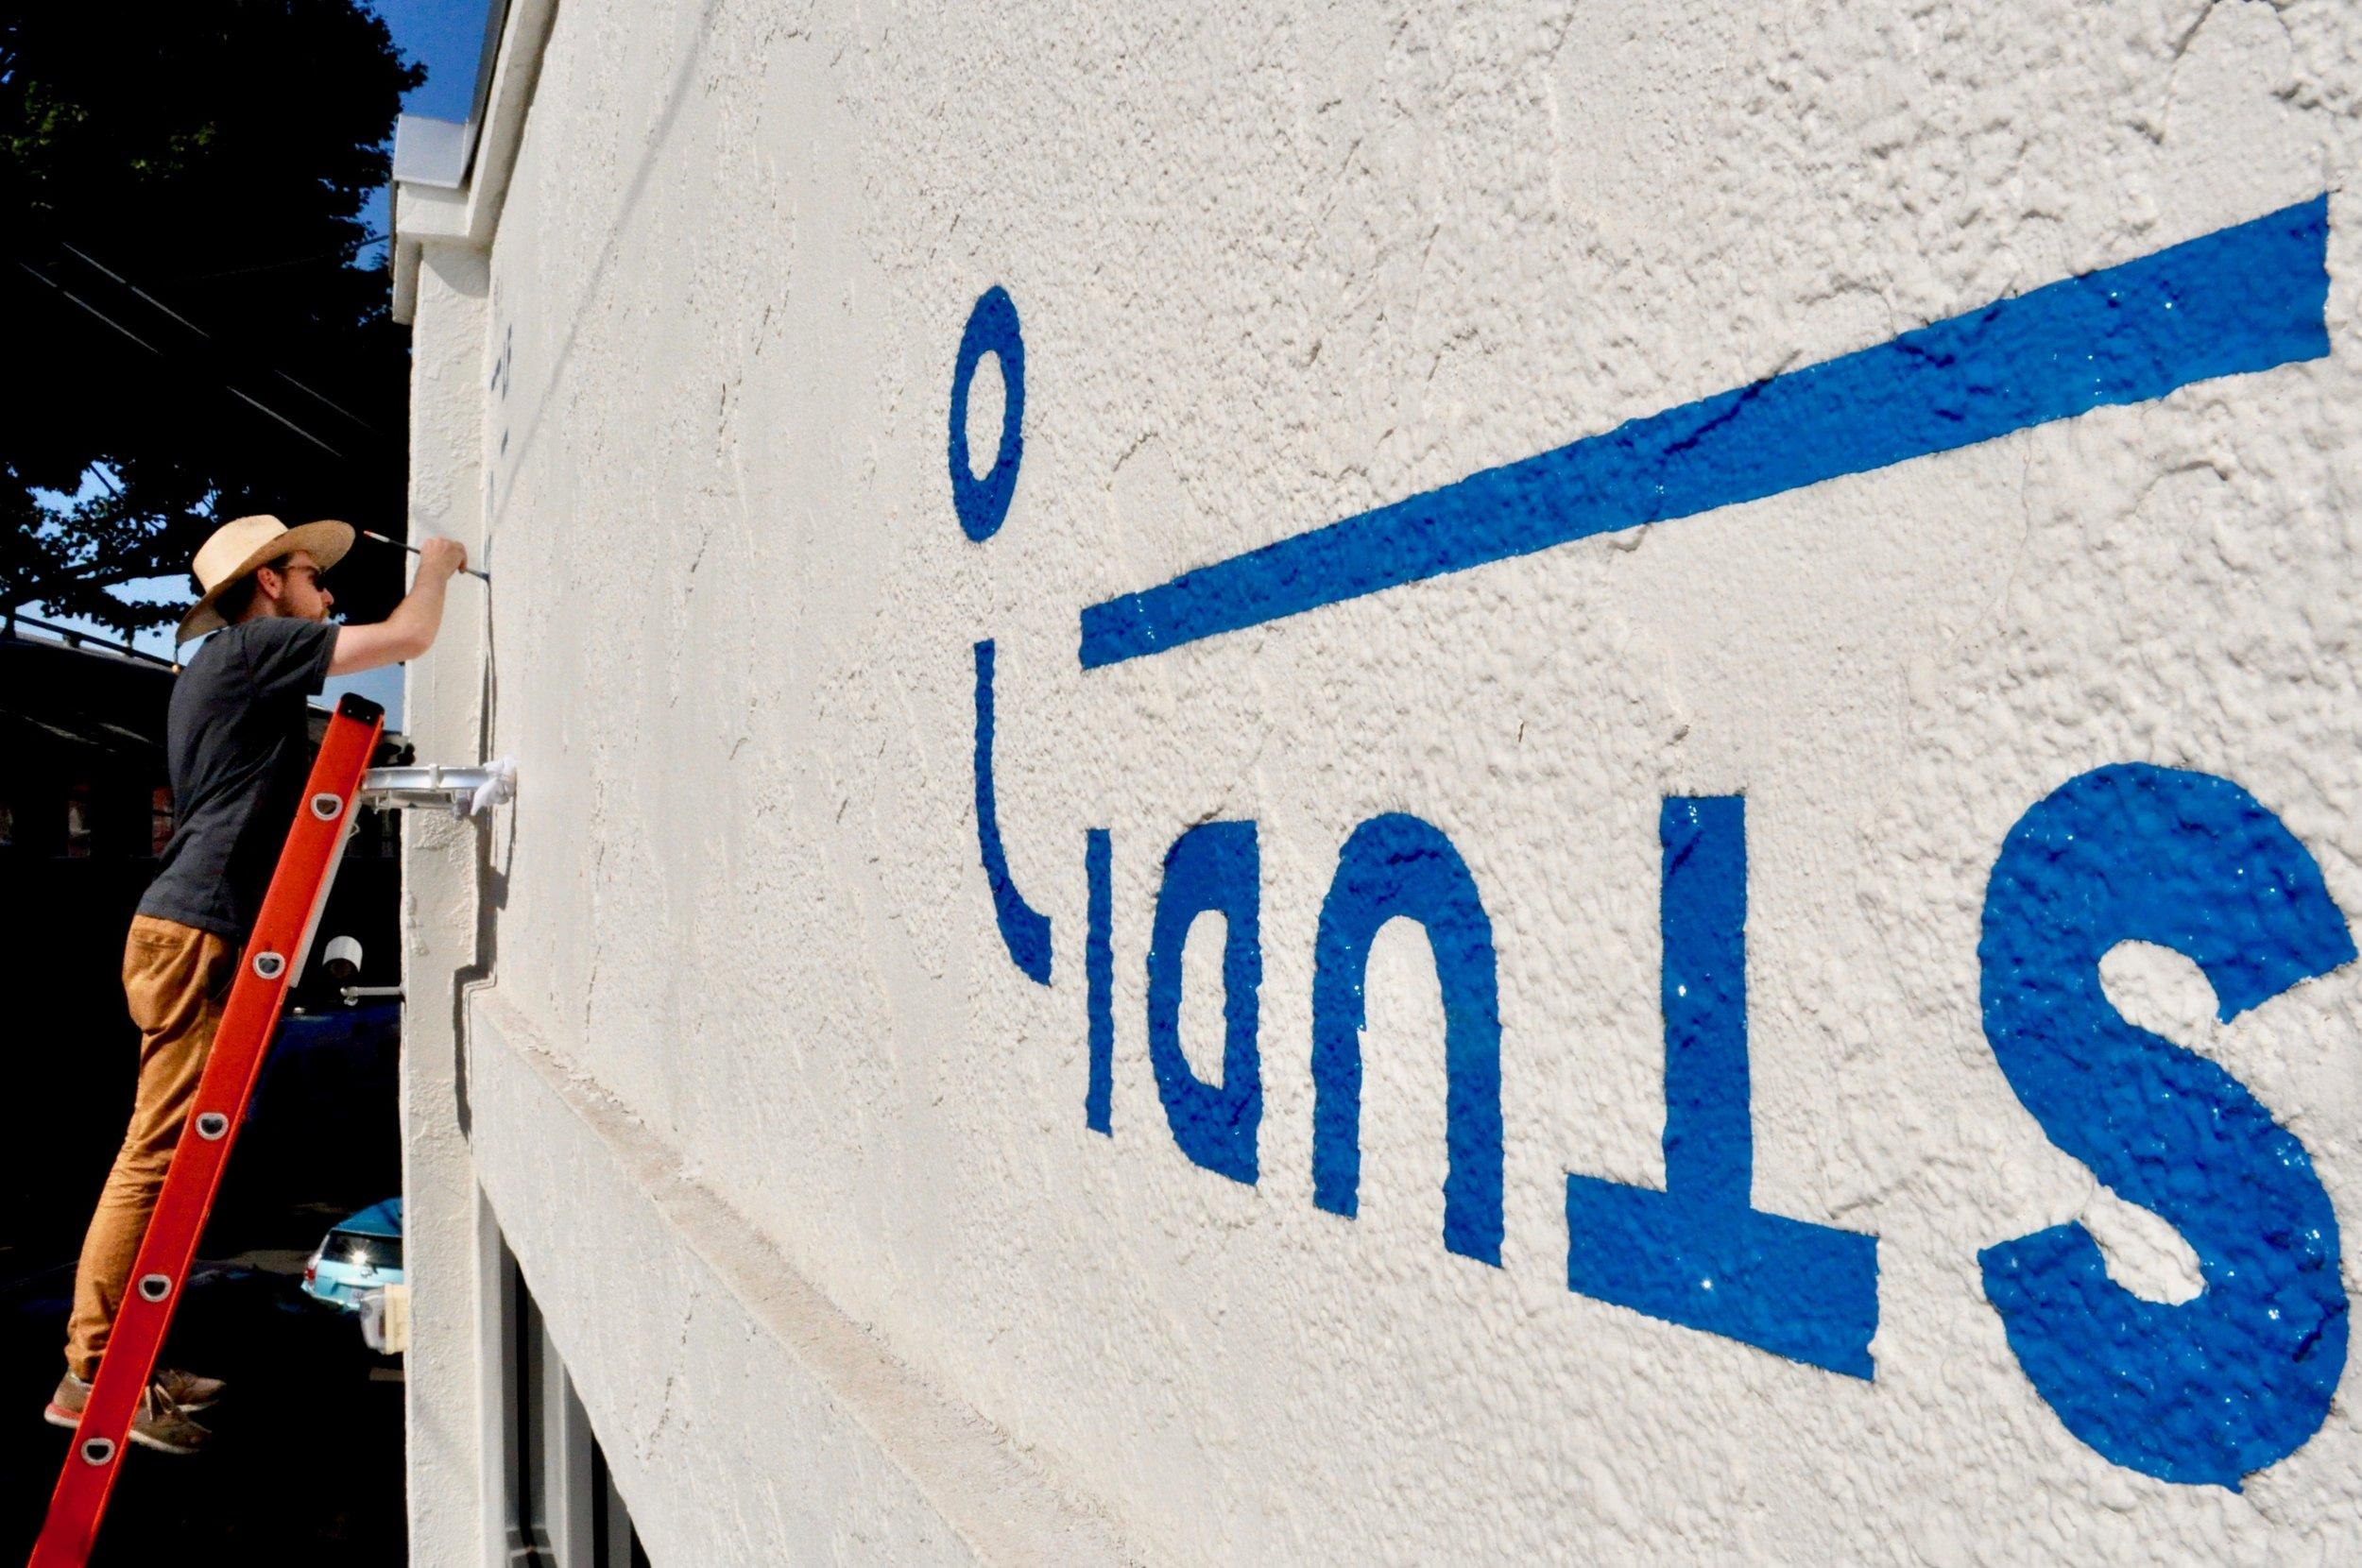 halfcourt sign.jpg